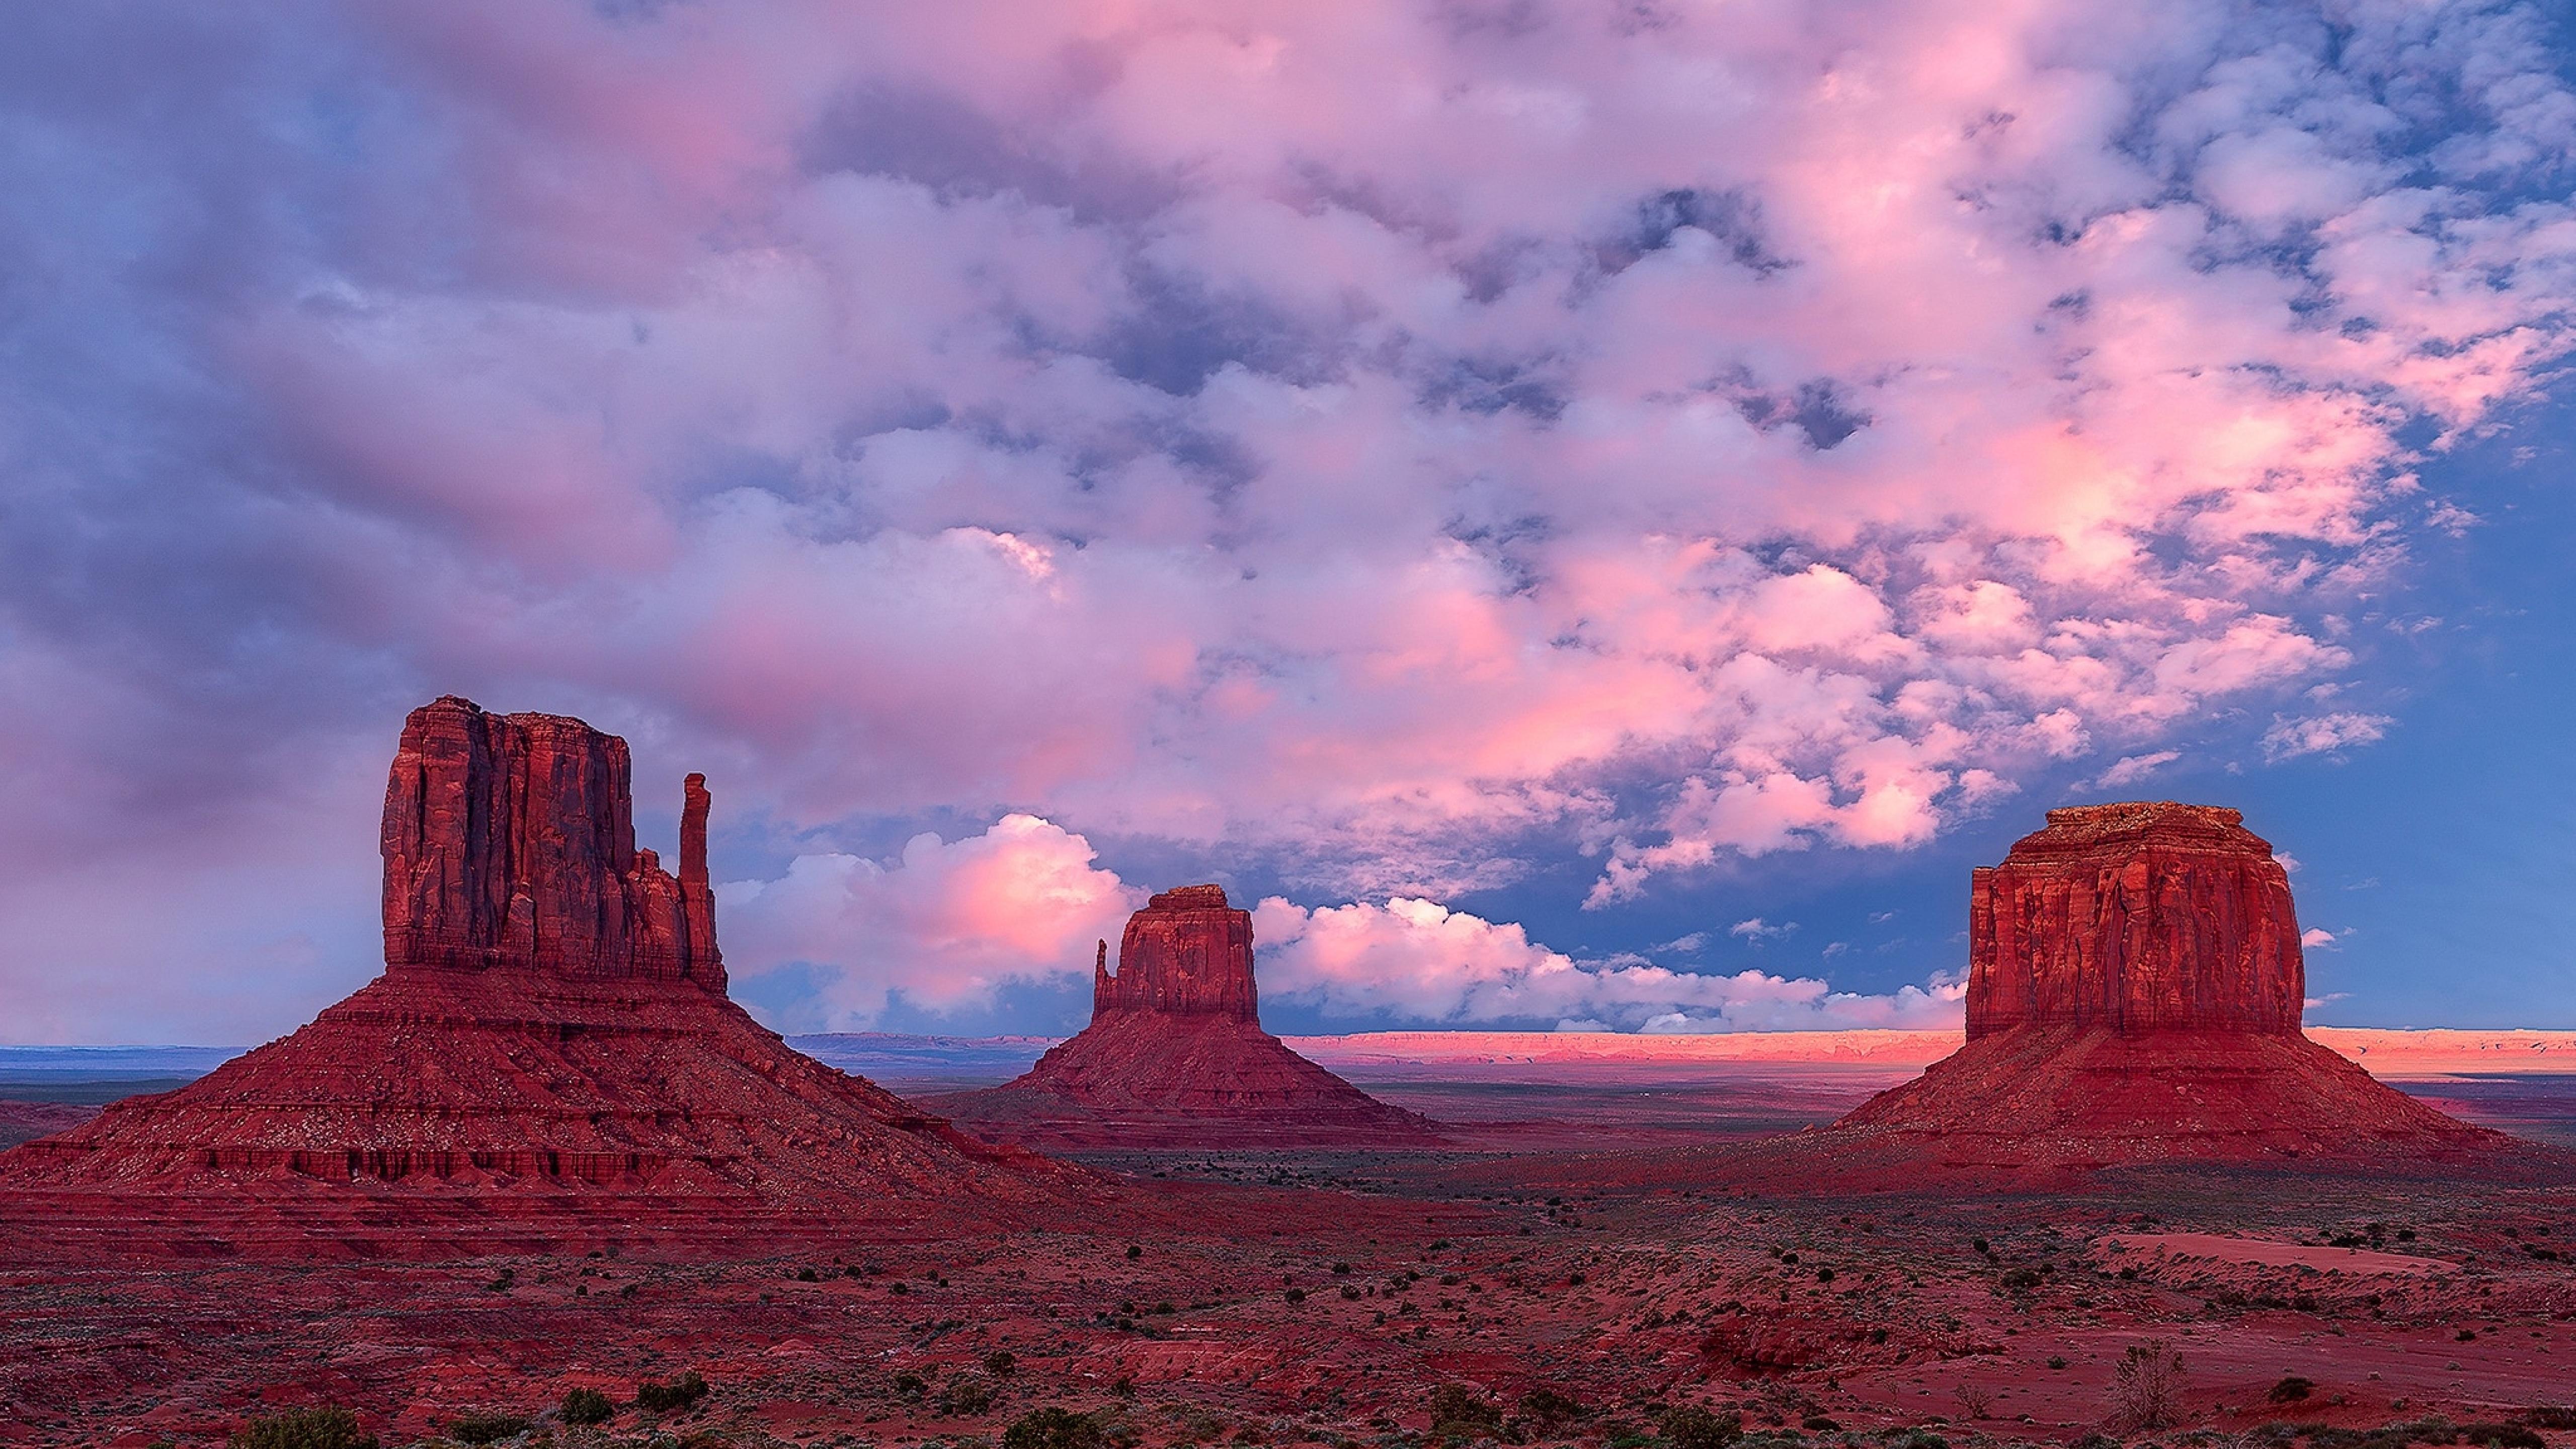 Stone Teardrop, Monument Valley, Utah в хорошем качестве